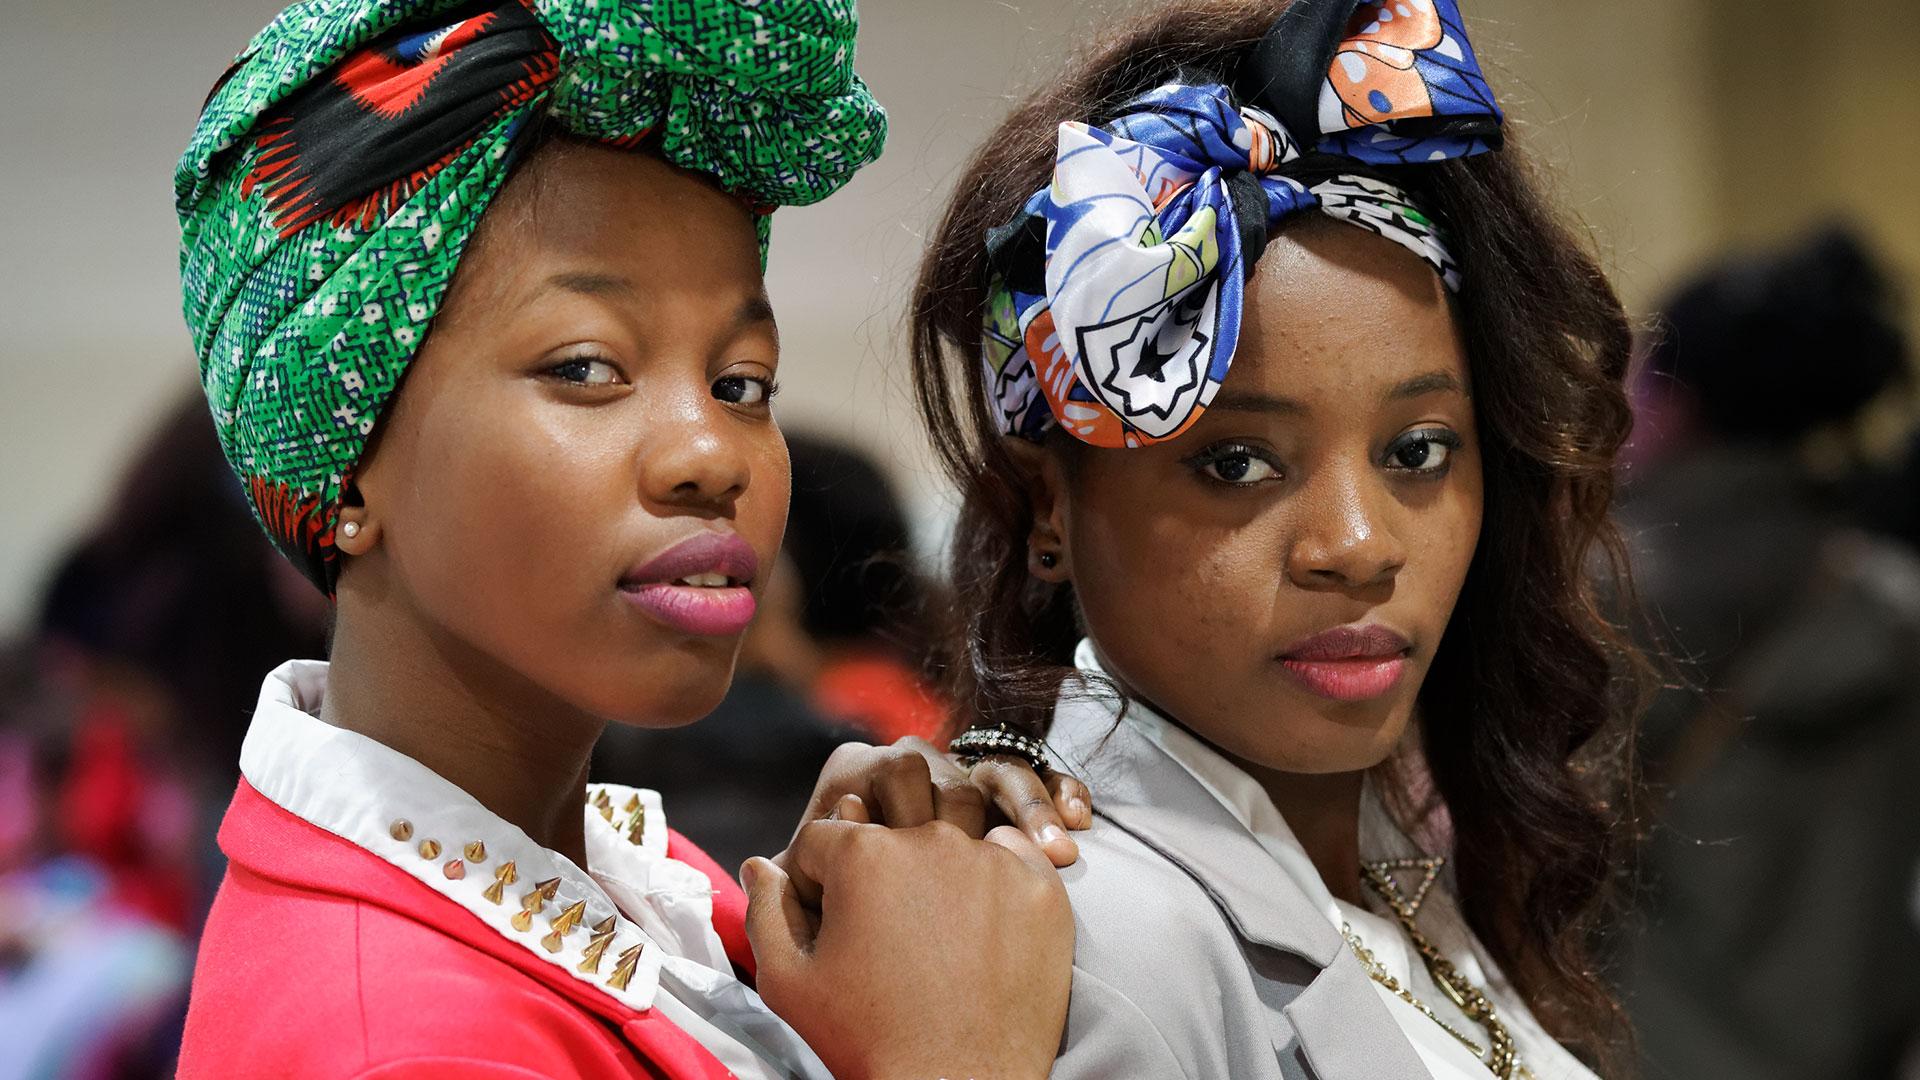 cester-filles-afric-festival-clae-2013